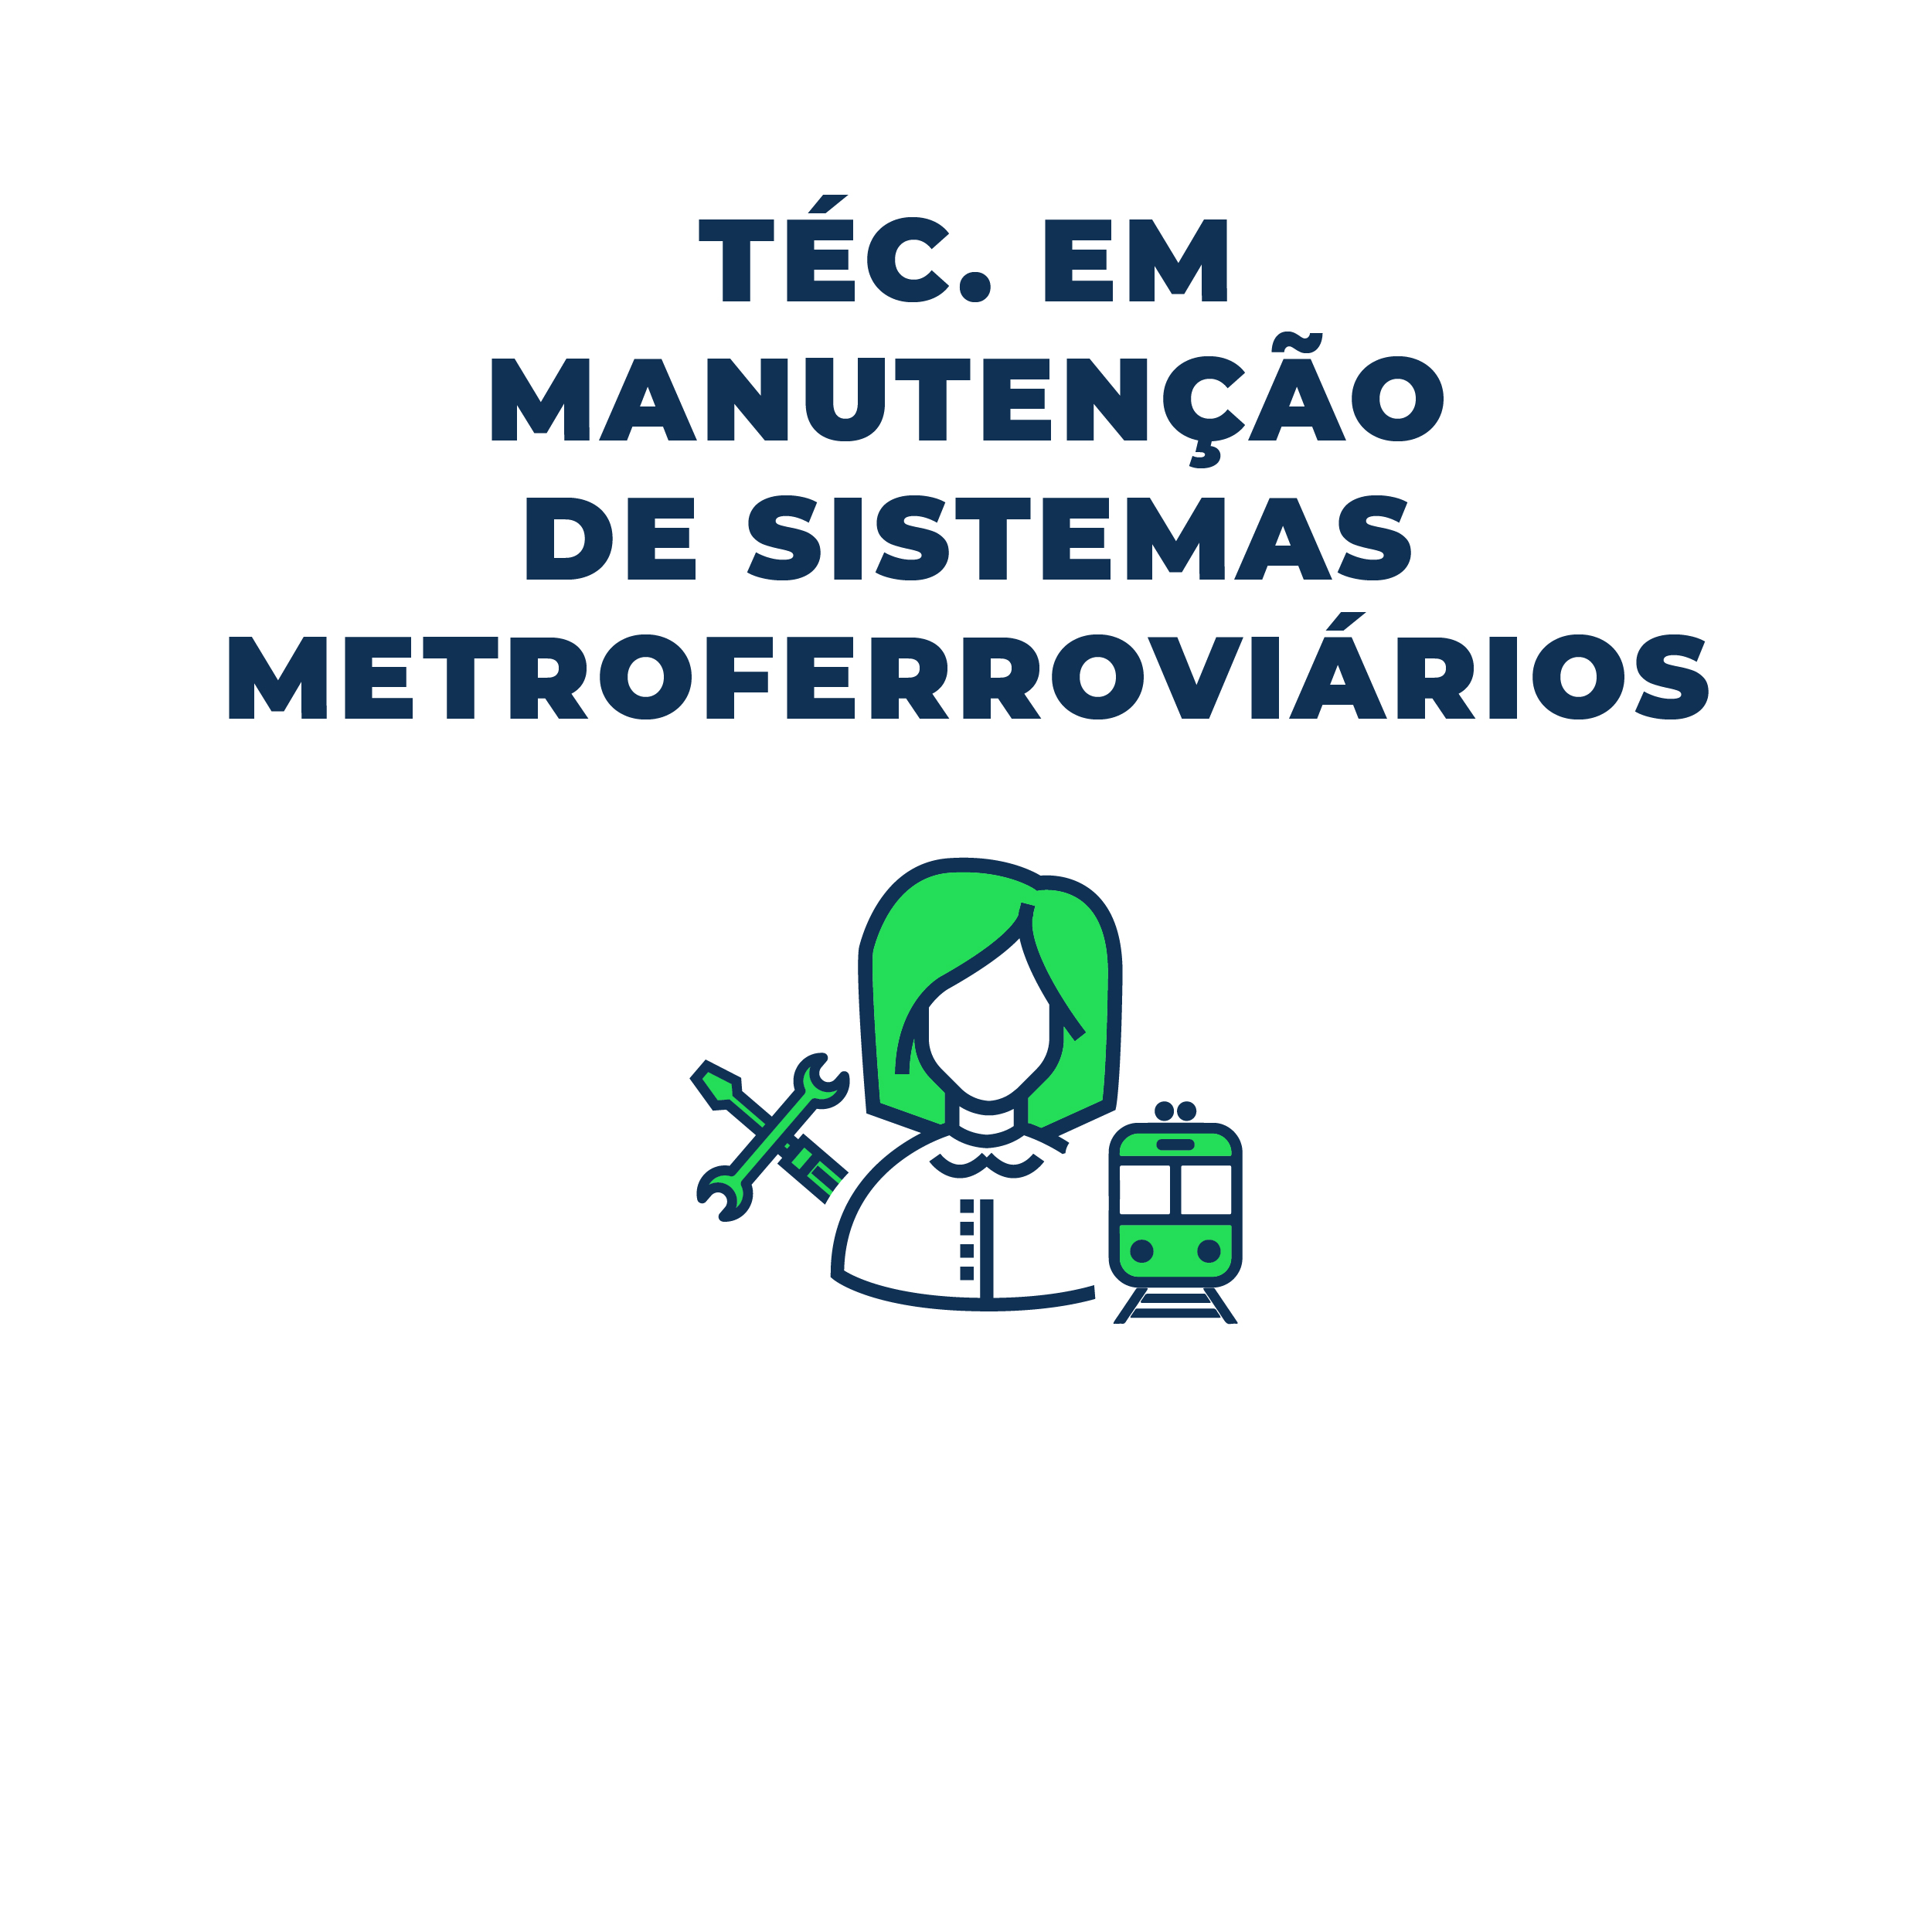 metroferroviarios